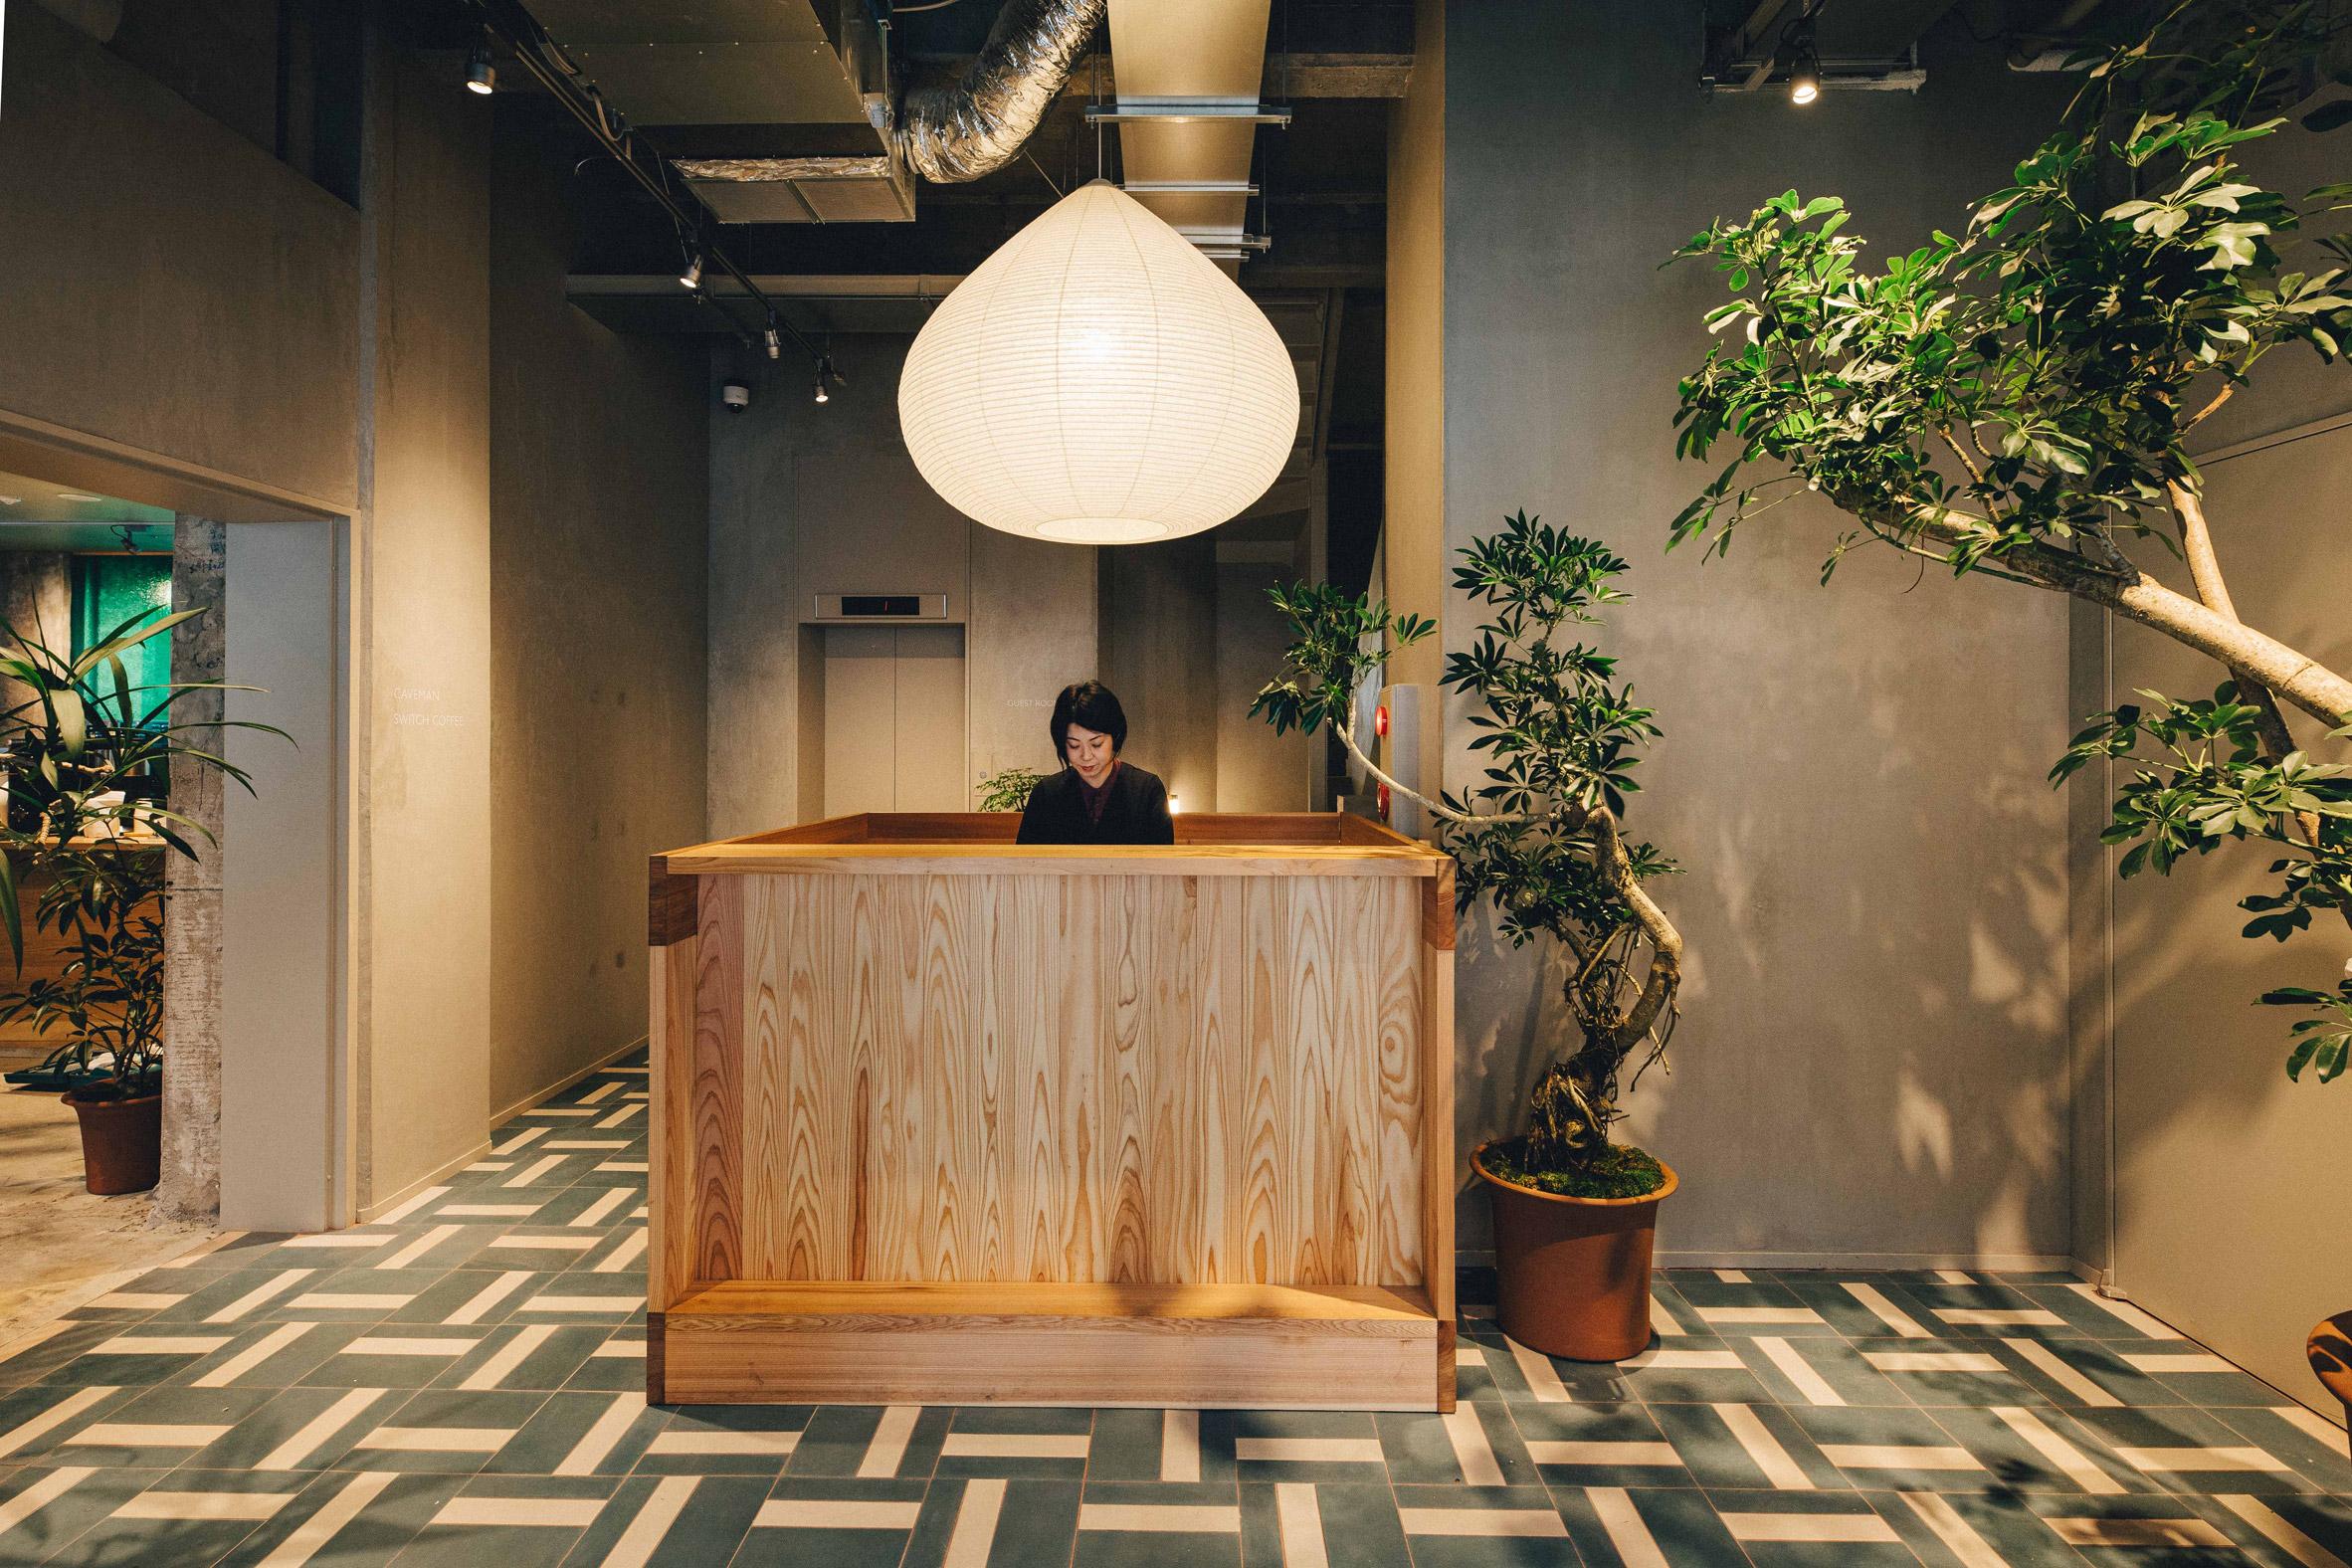 K5 Tokyo hotel by Claesson Koivisto Rune reception